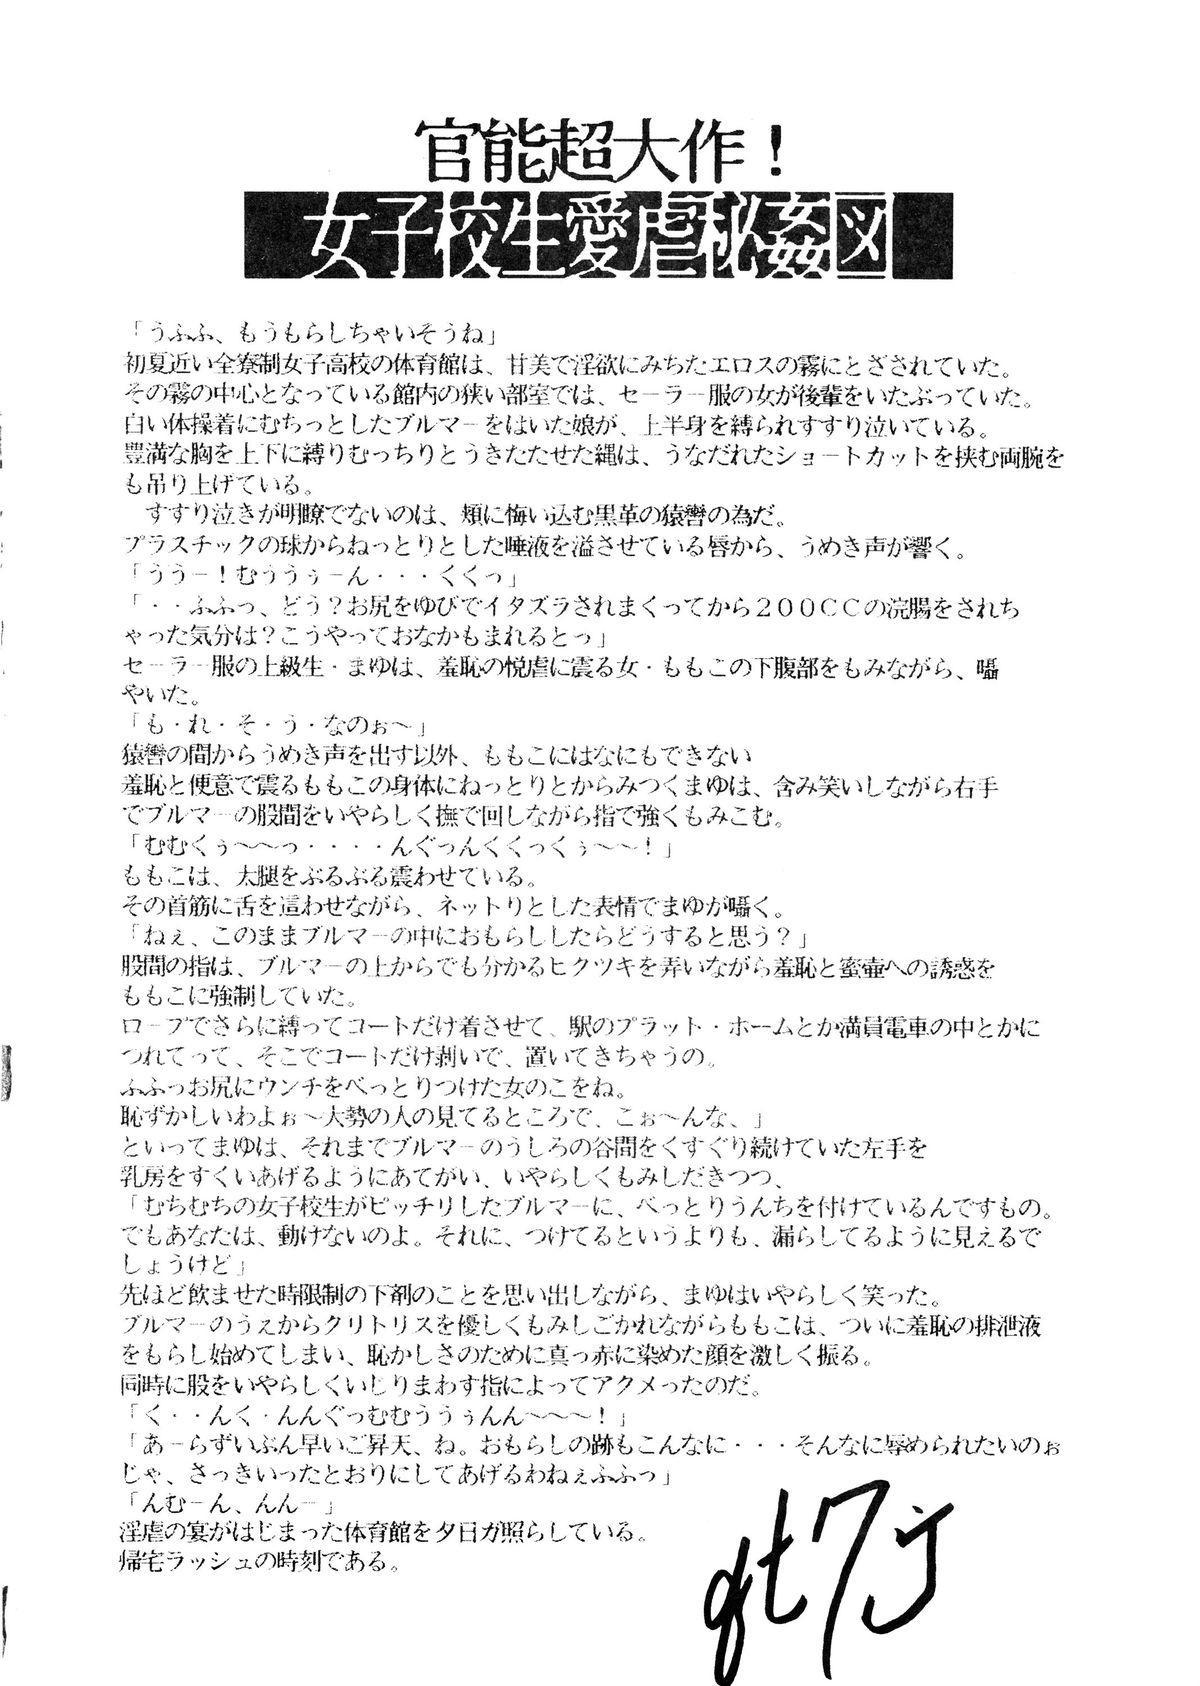 [Secret Society Chi (Iijima Mario)] Kai II - Iijima Mario Kojin-shi - (Various) 46